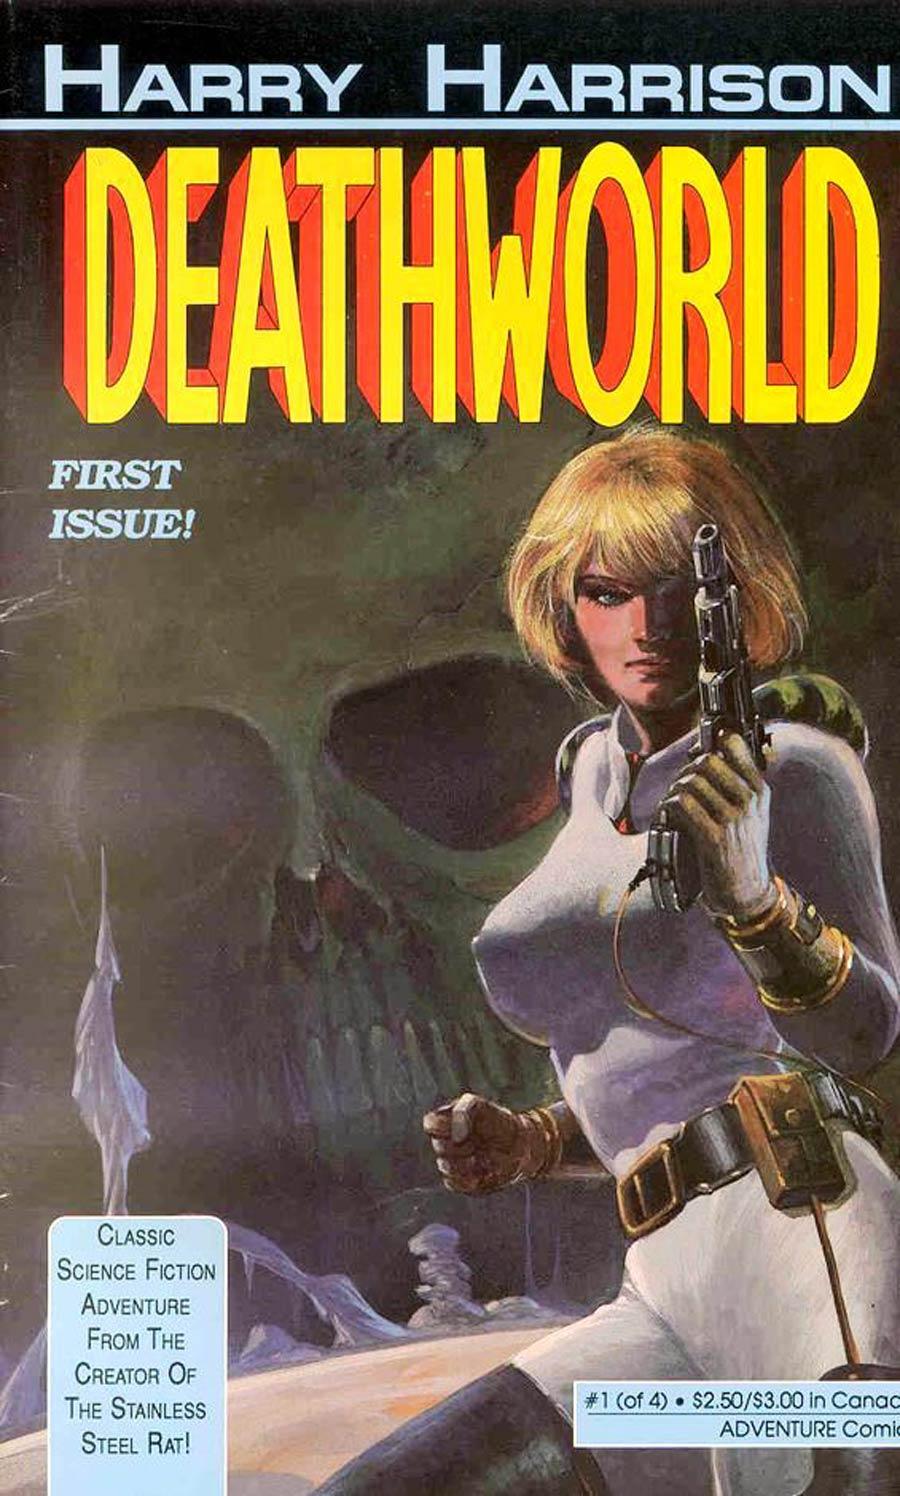 Deathworld #1